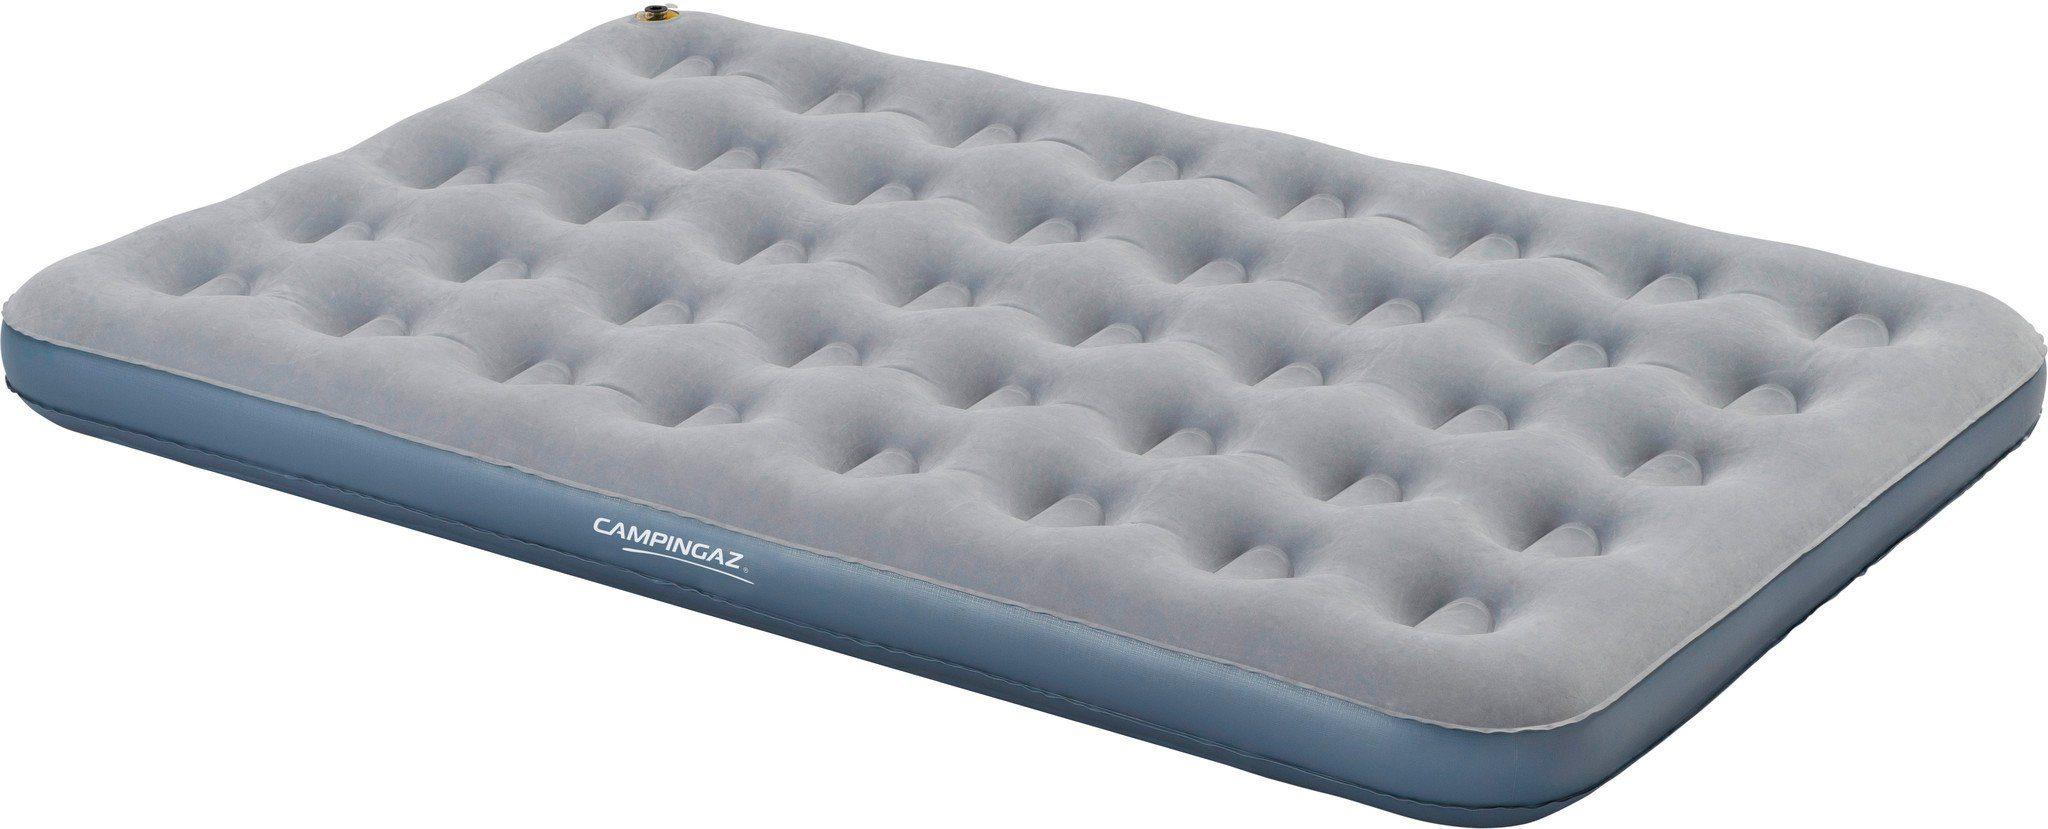 Campingaz Bett & Liegen »Quickbed Compact Airbed Double«